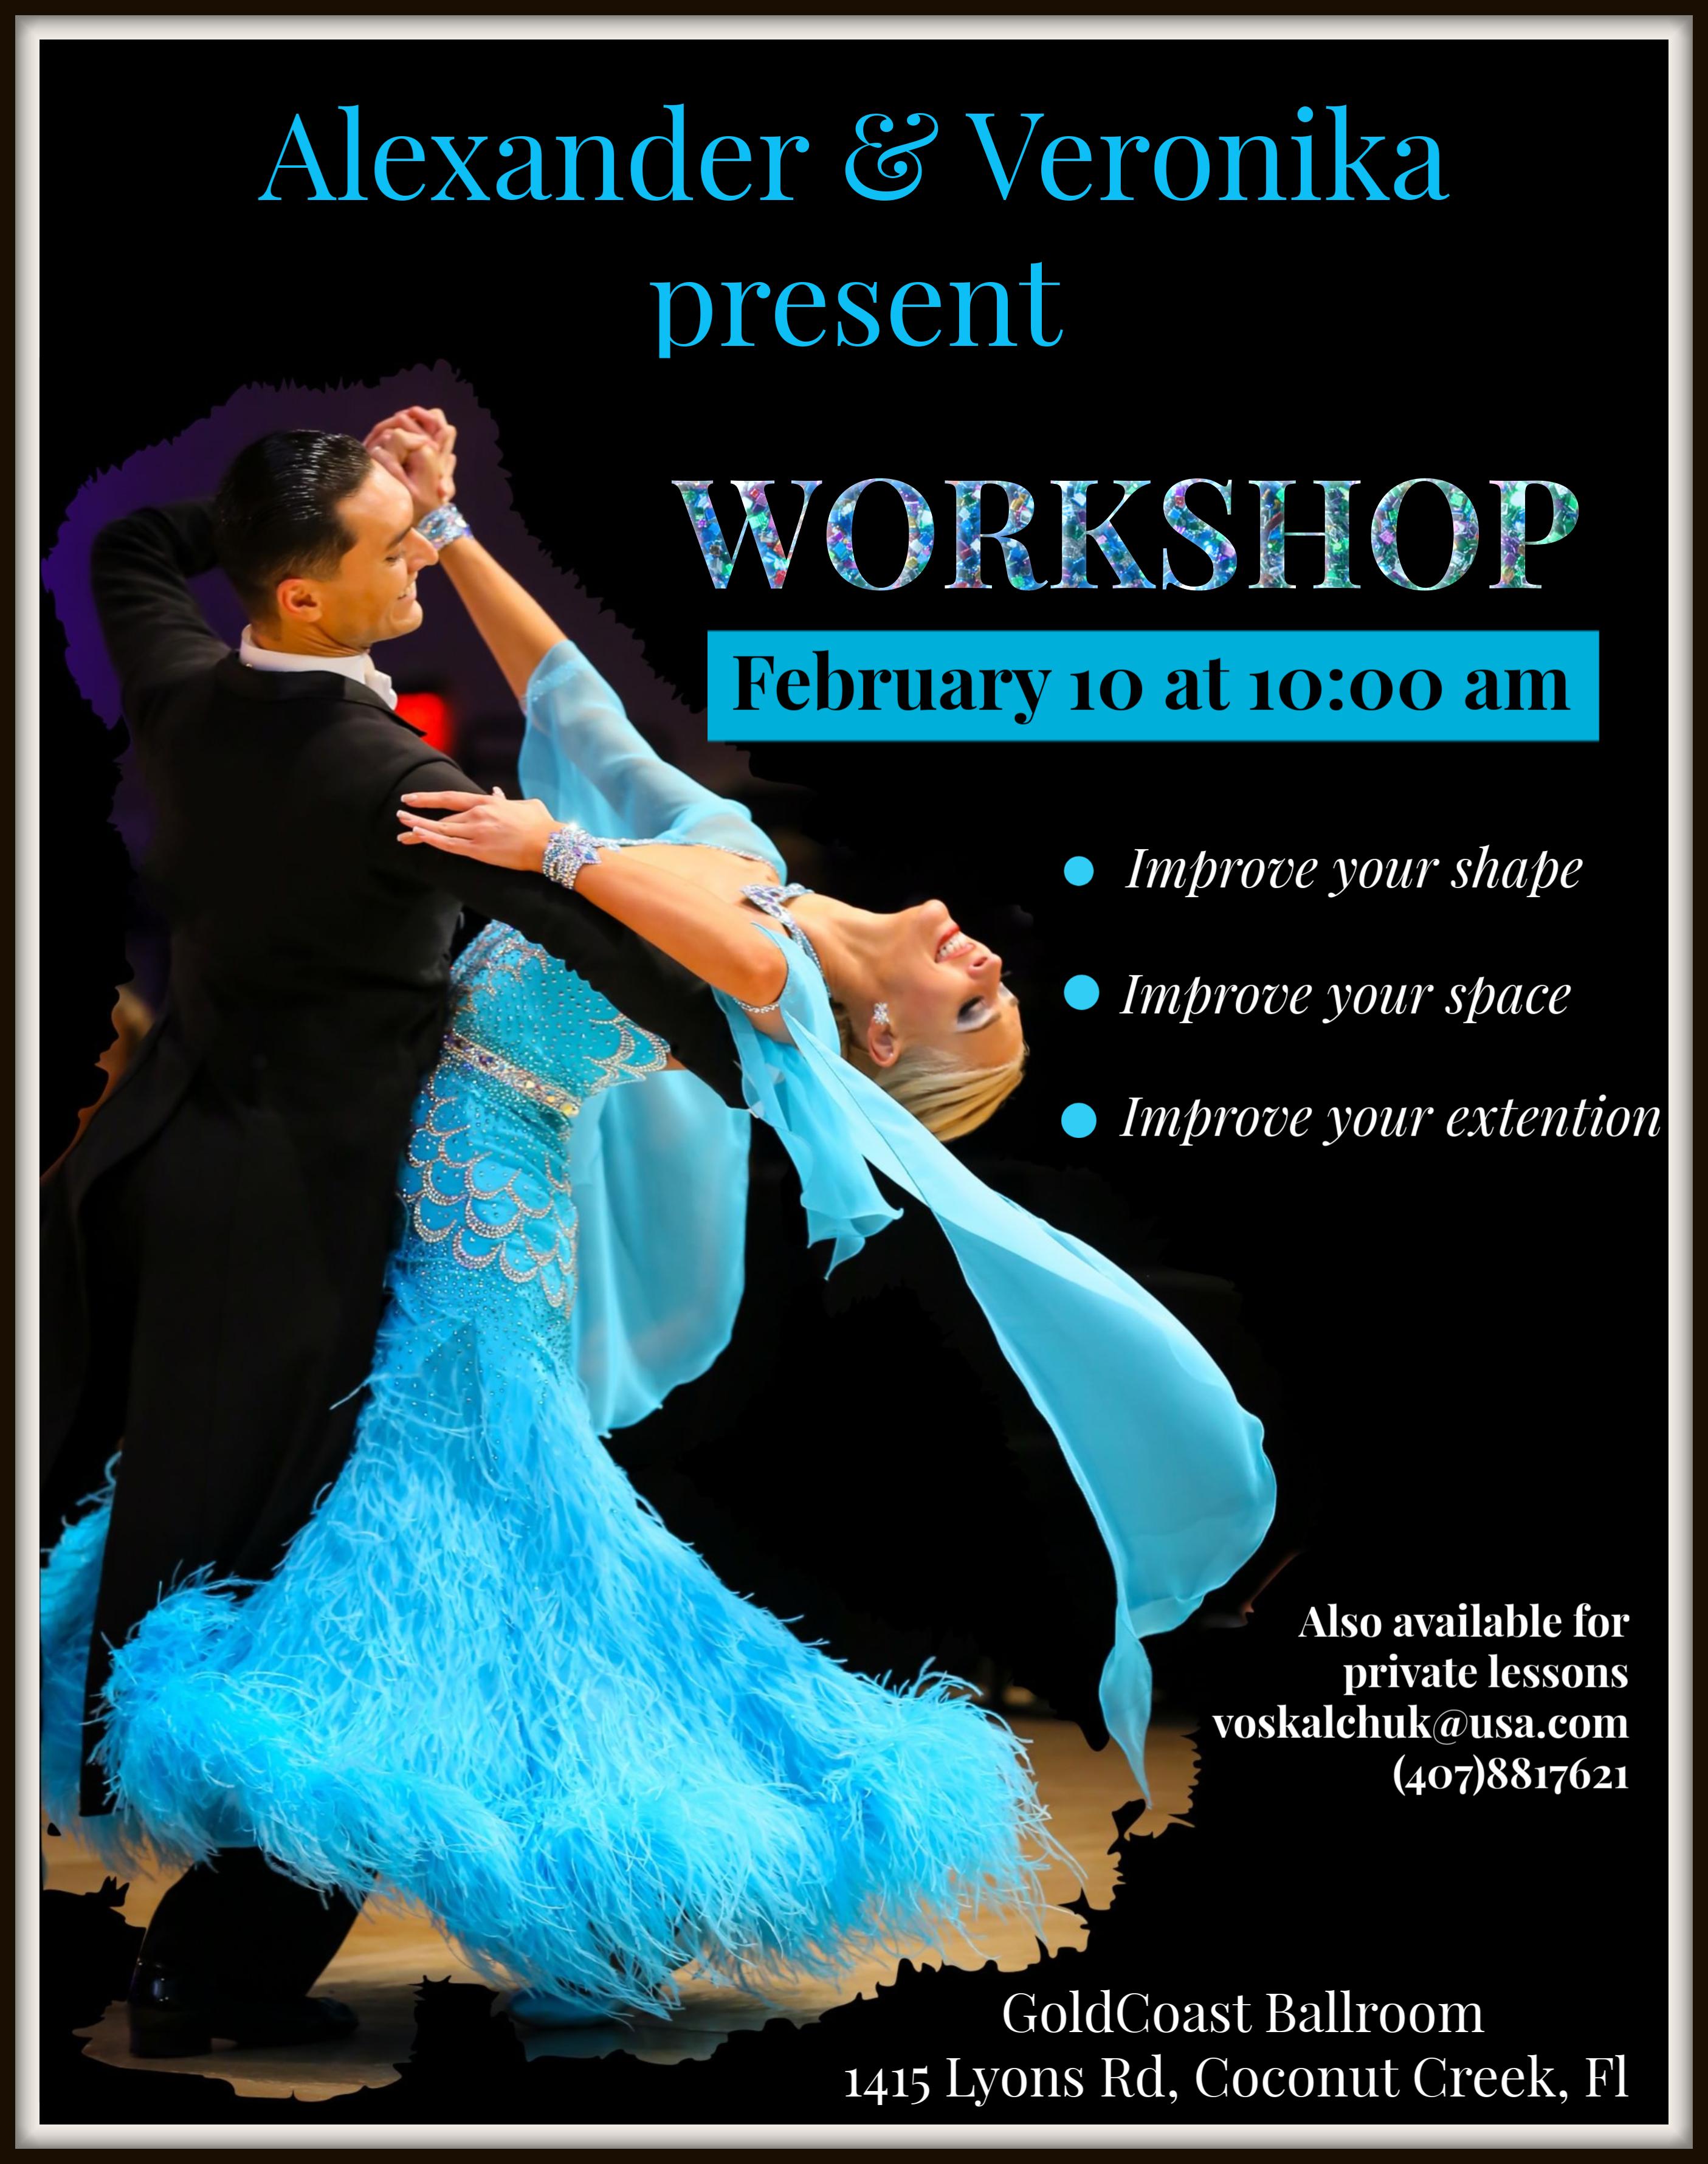 Alexander & Veronika Voskalchuk - Workshop - February 10, 2019 (10 AM) at Goldcoast Ballroom